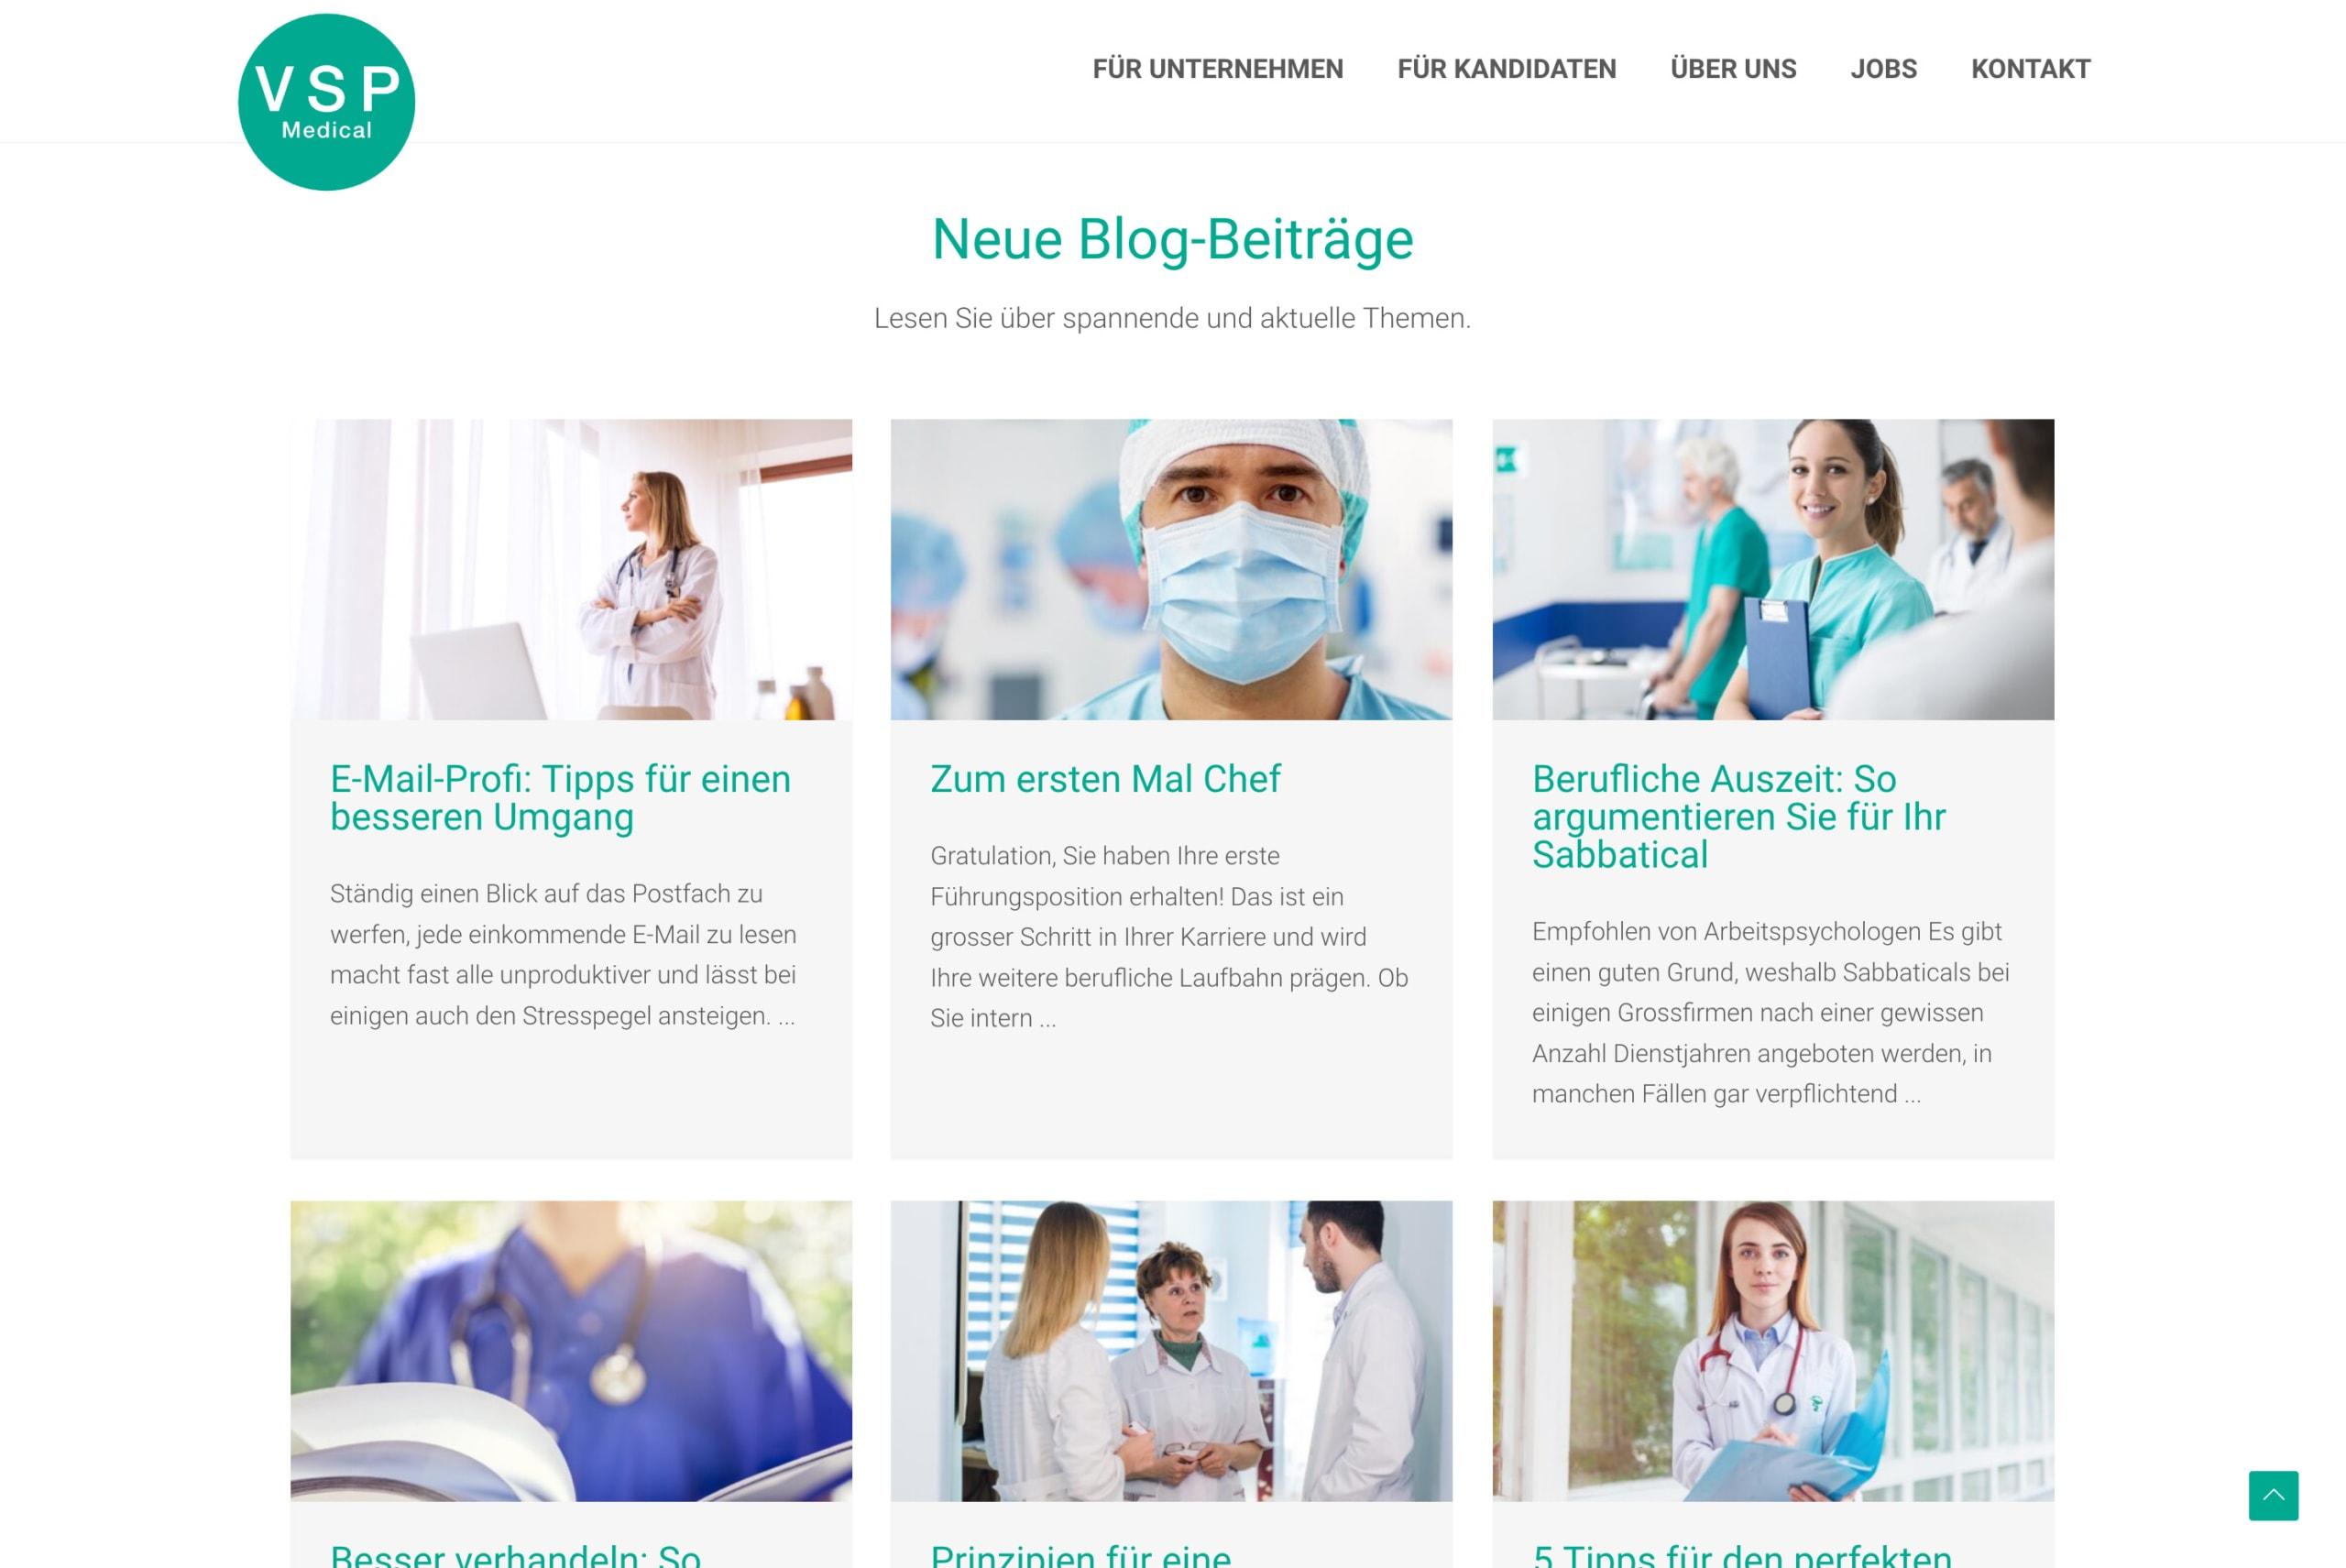 Screenshot 2021 02 08 Vsp Medical – Unternehmens Und Kaderberatung(2)